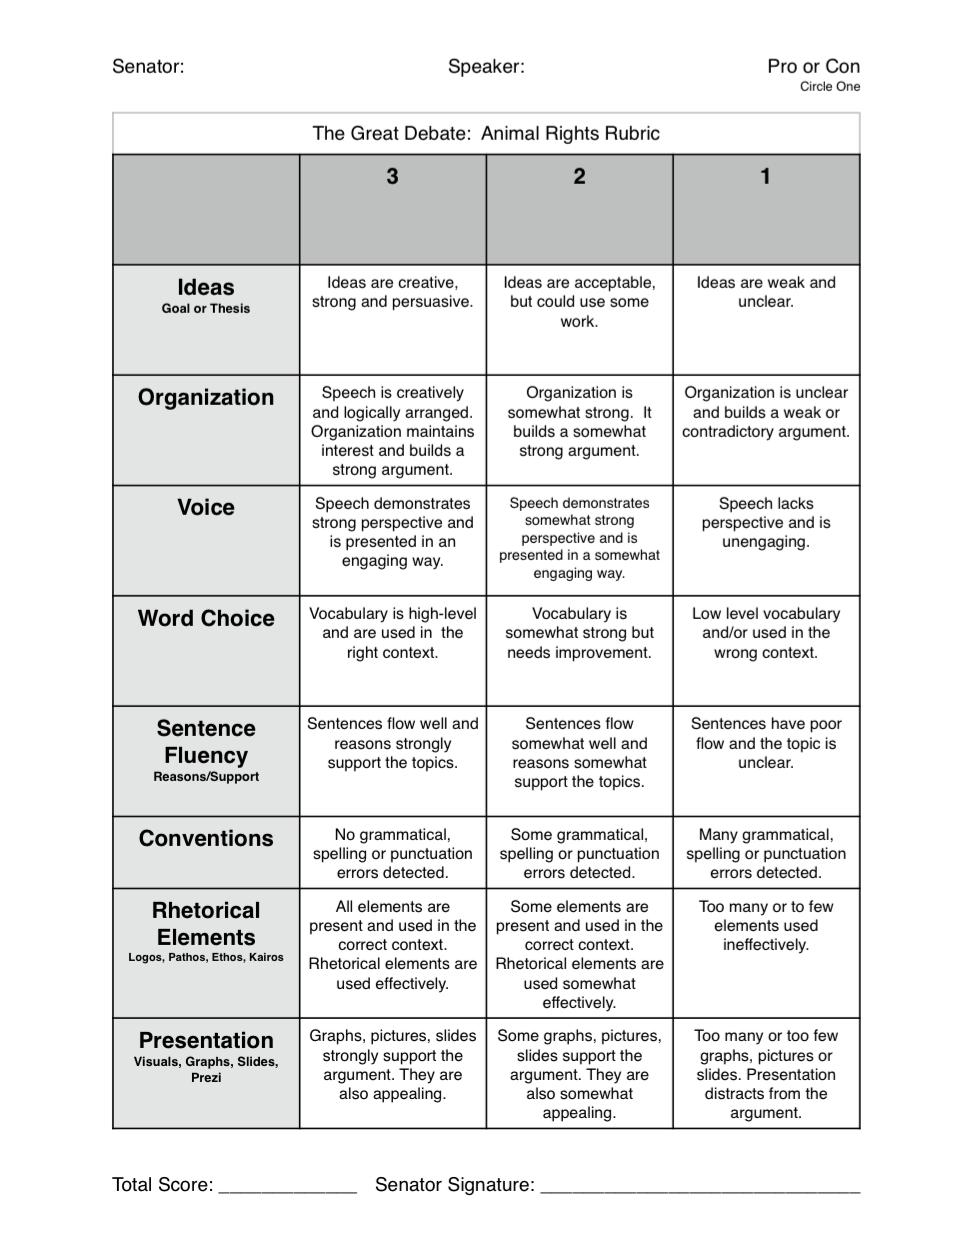 Classroom Design Rubric : Image gallery debate layout